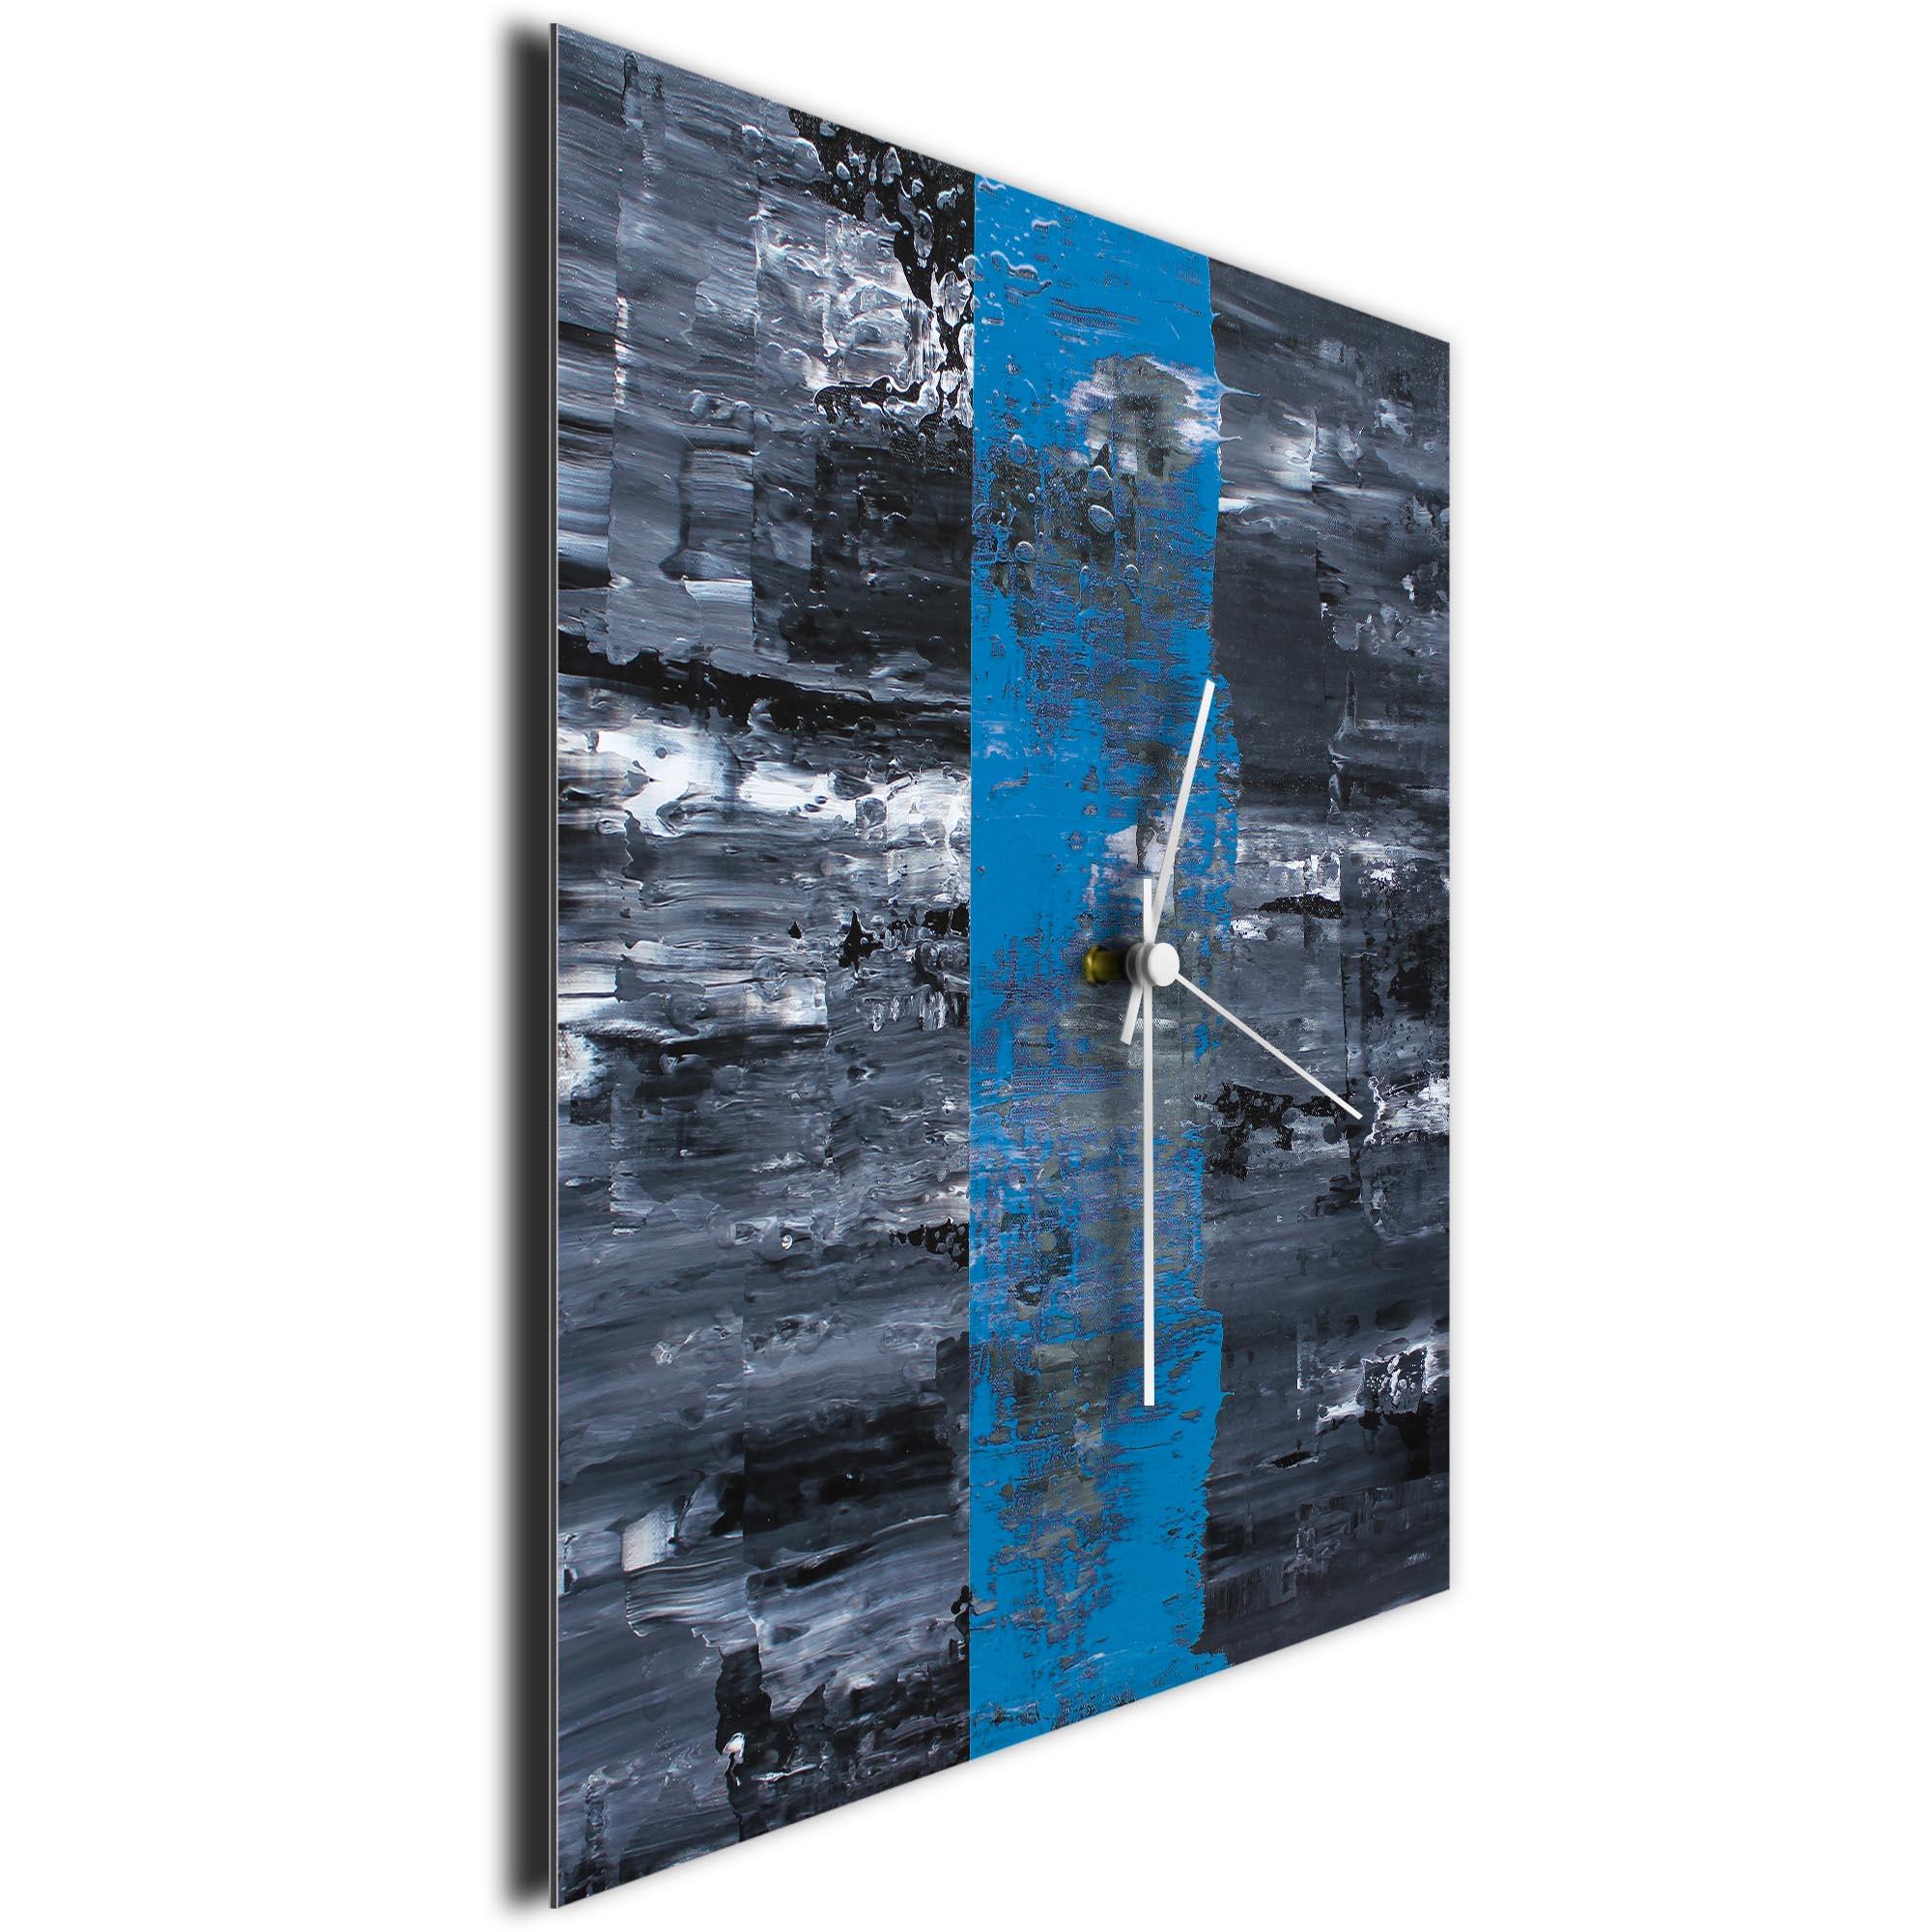 Blue Line Square Clock by Mendo Vasilevski - Urban Abstract Home Decor - Image 3